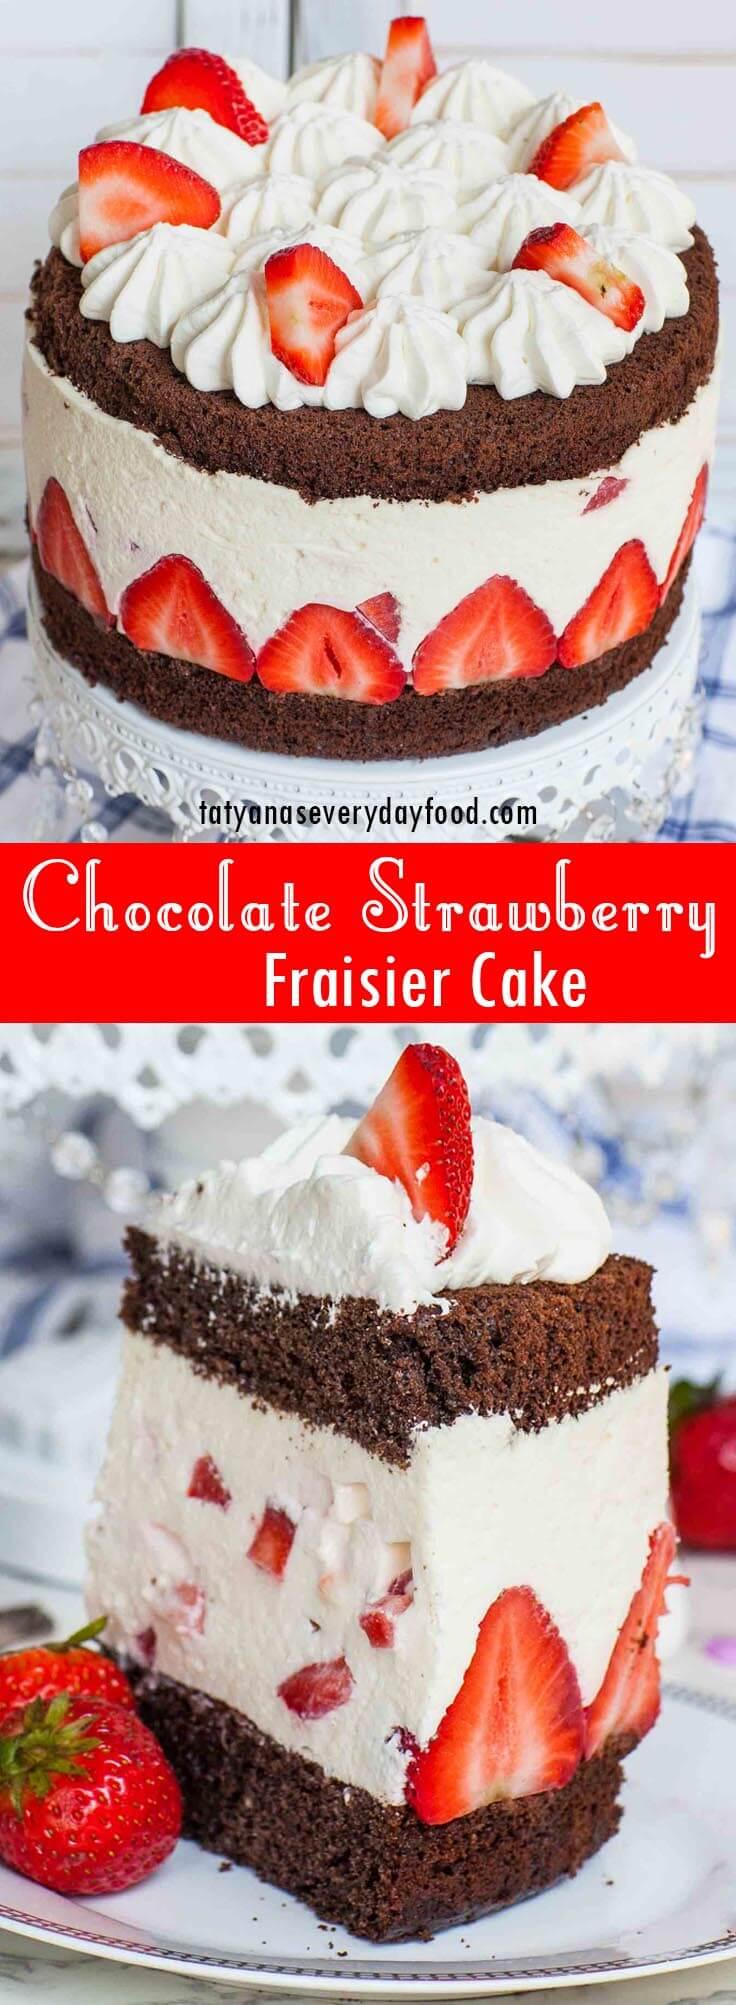 Chocolate Strawberry Fraisier Cake video recipe